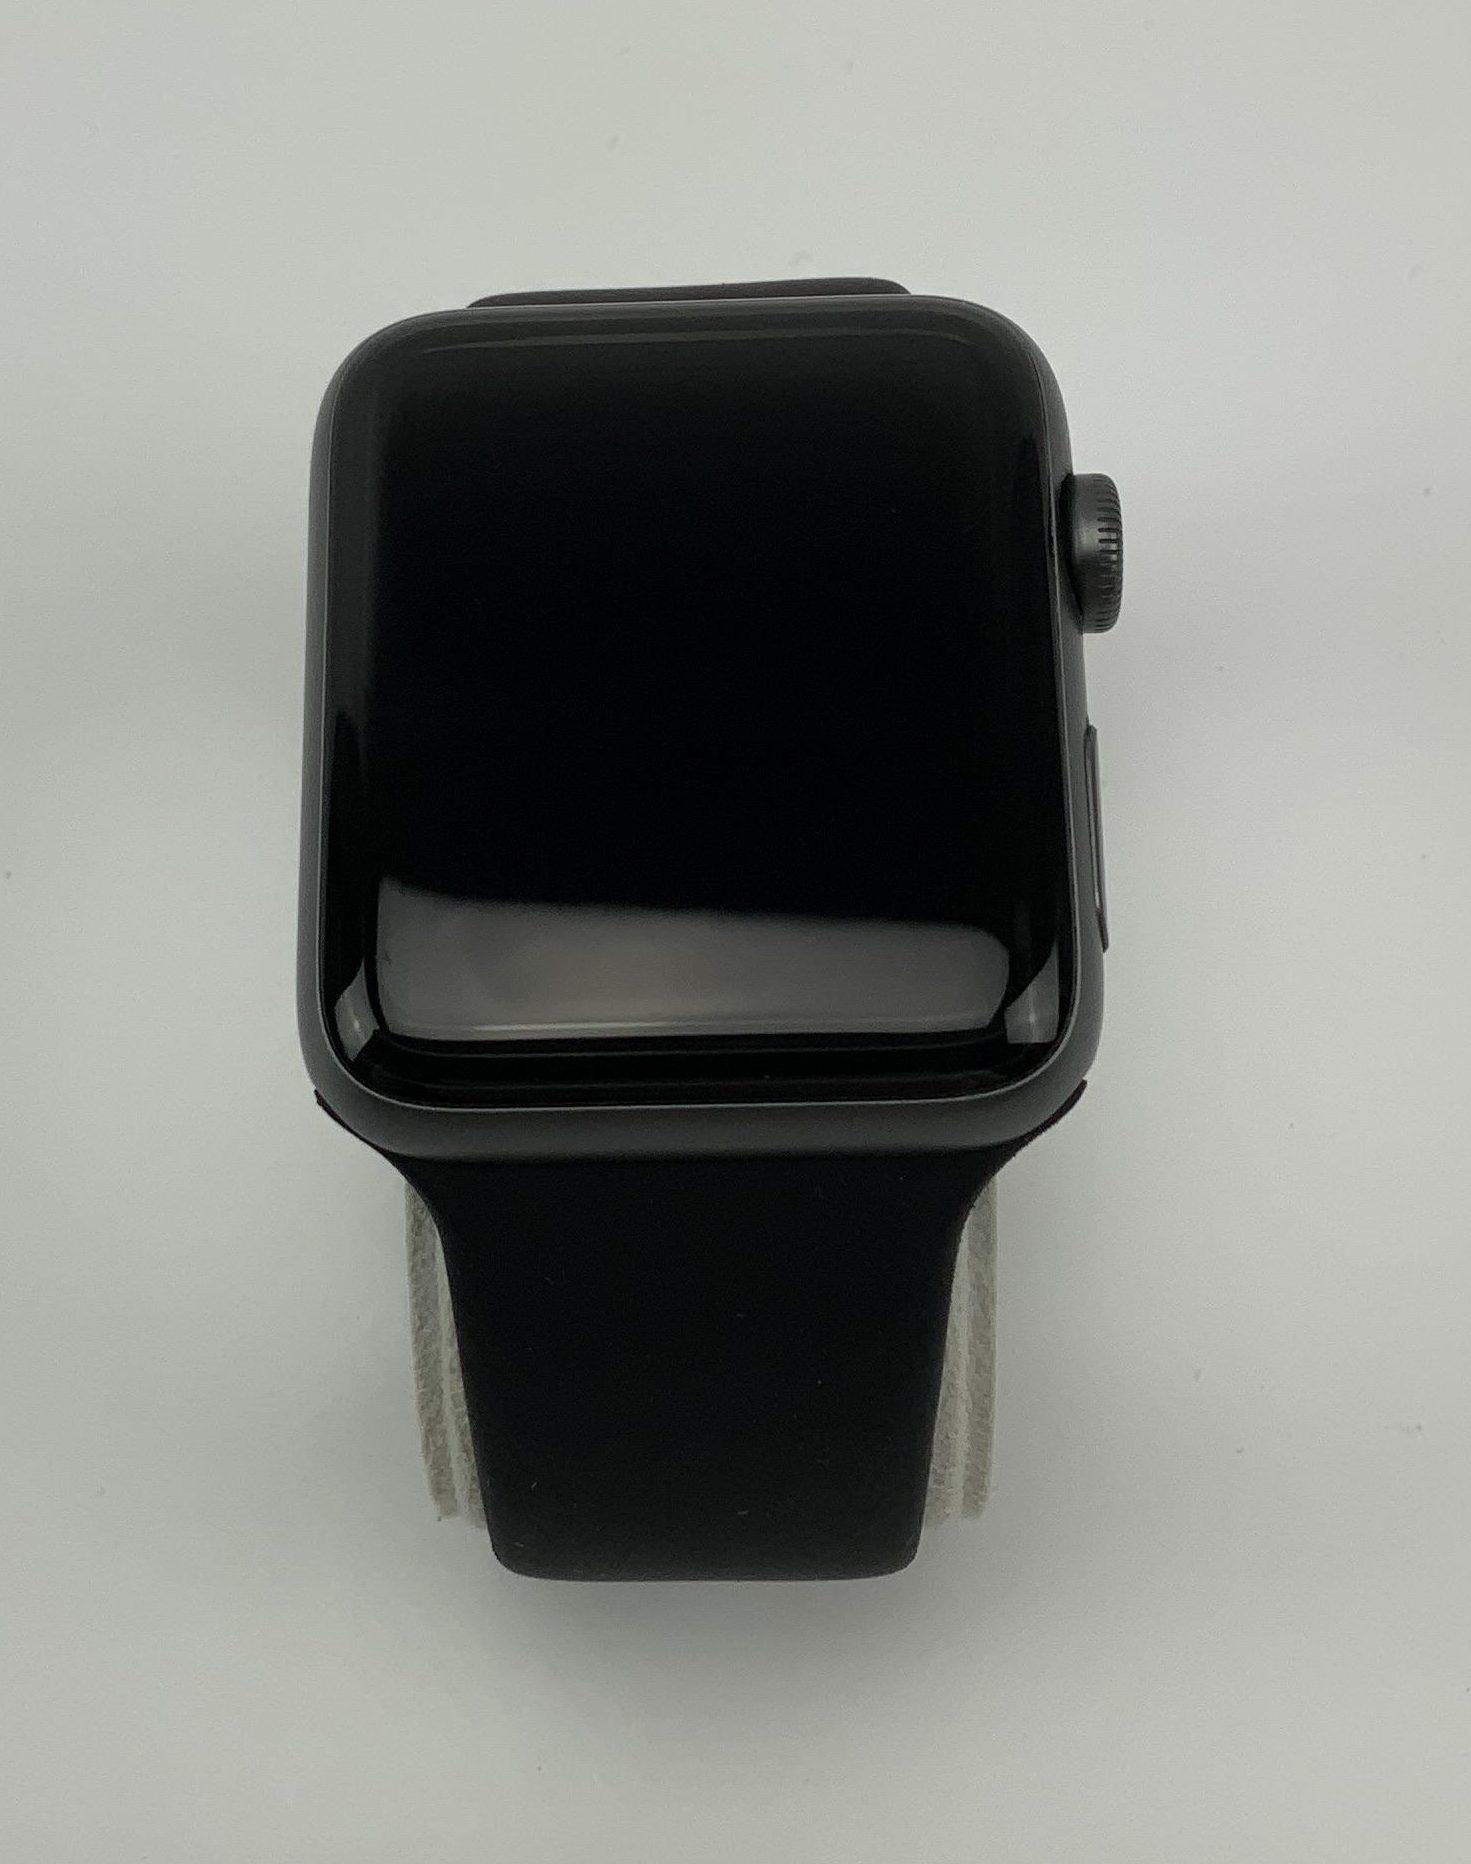 Watch Series 2 Aluminum (42mm), Space Gray, Black Sport Band, obraz 1